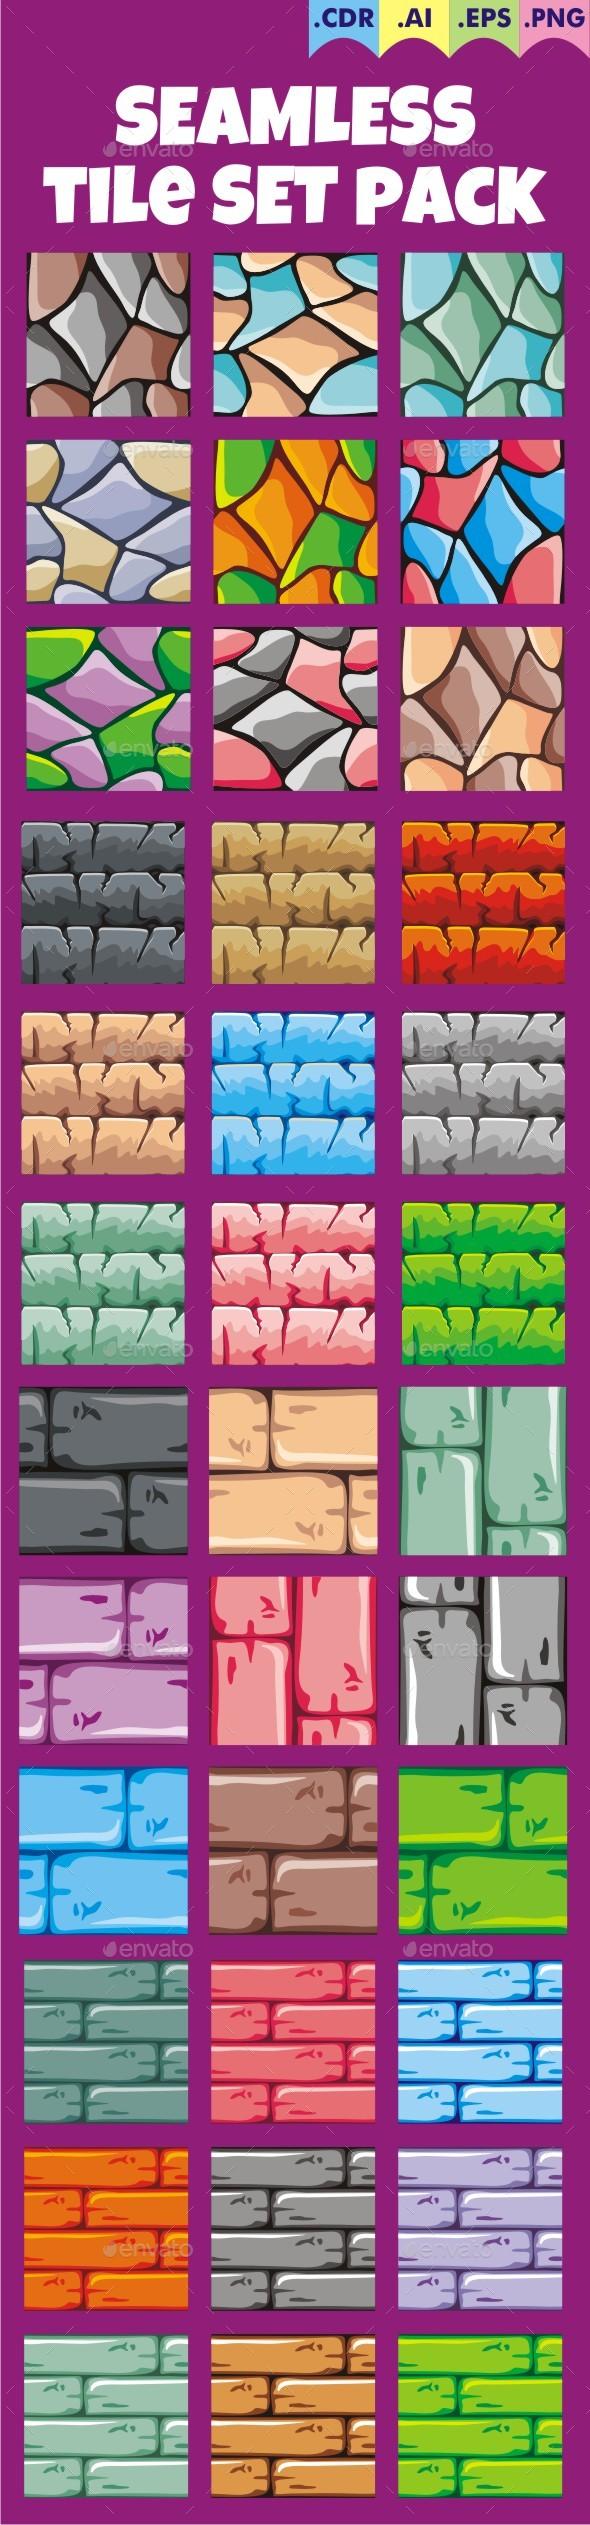 Seamless Tileset Pack 4 - Tilesets Game Assets